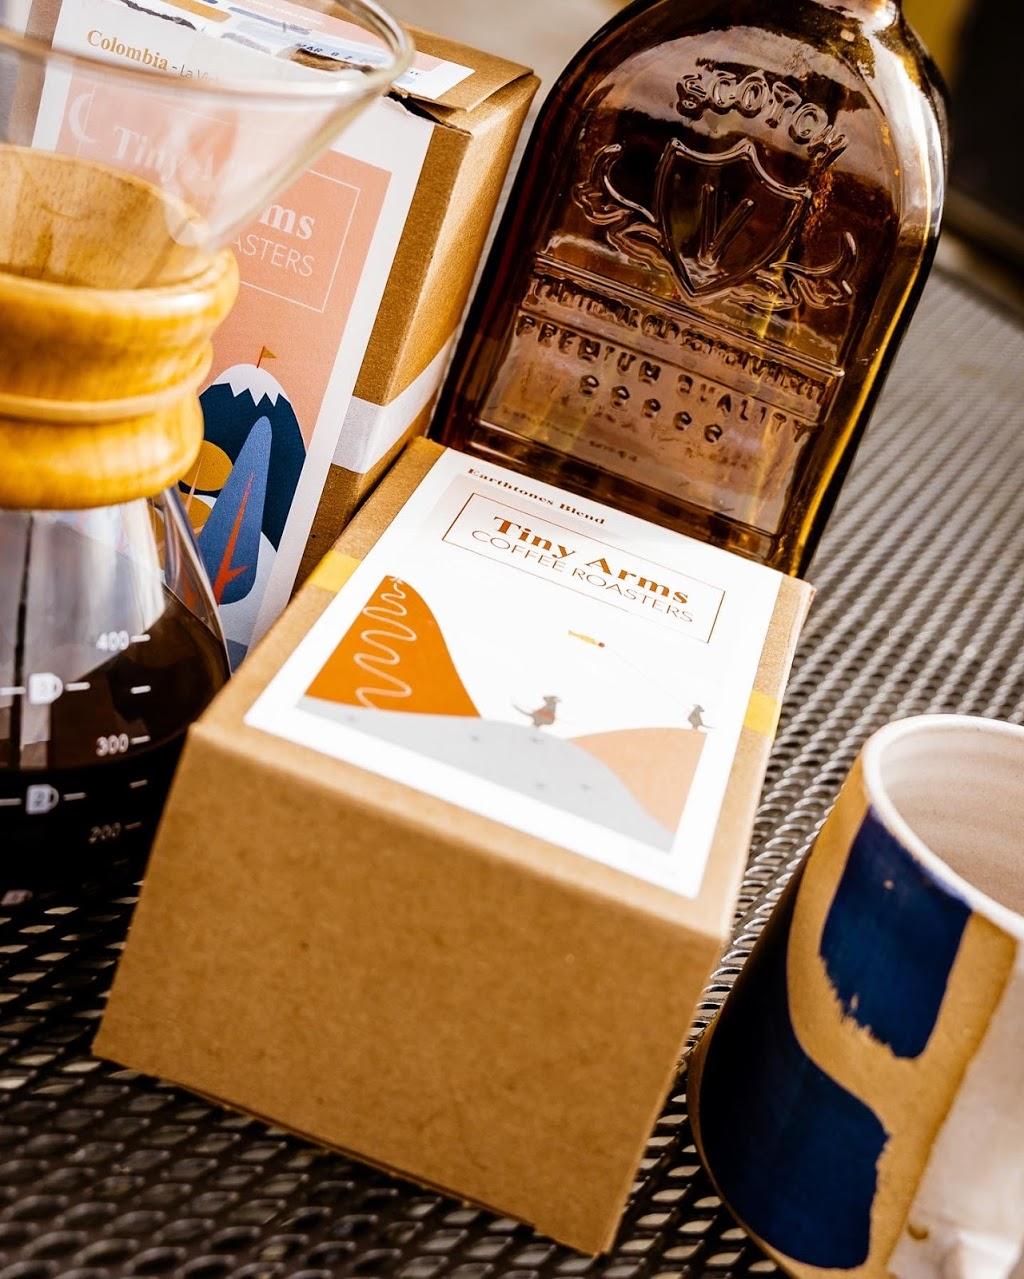 Tiny Arms Coffee Roasters | cafe | Loading Dock A Mill, 122 Western Ave, Lowell, MA 01851, USA